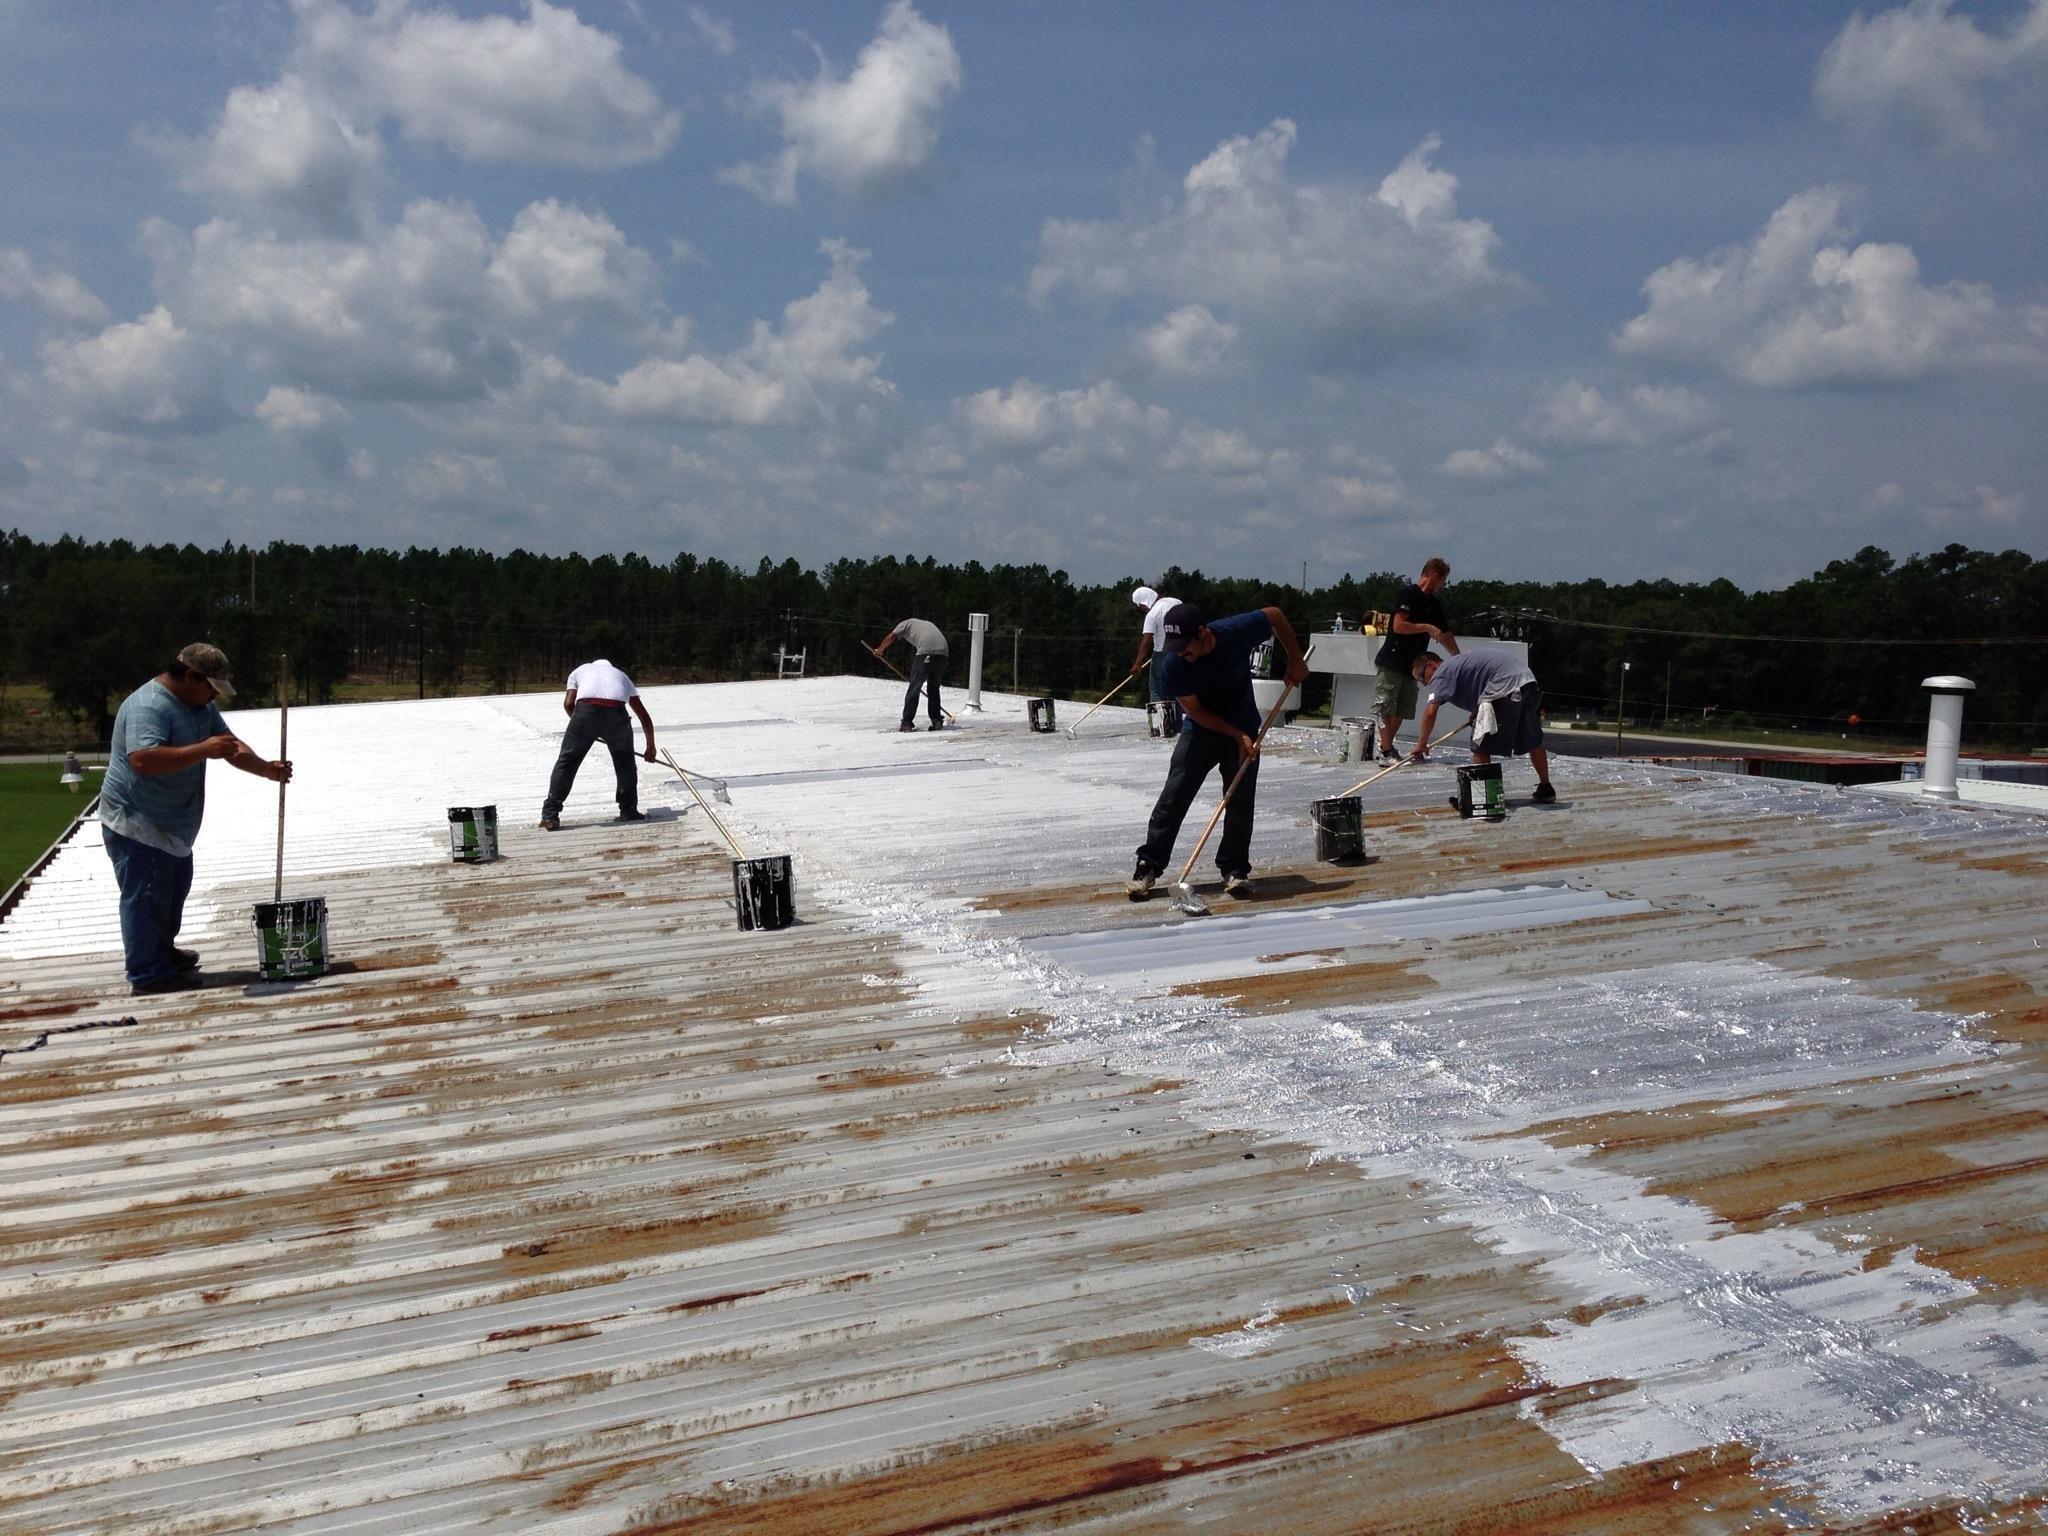 RoofCrafters-Savannah image 67